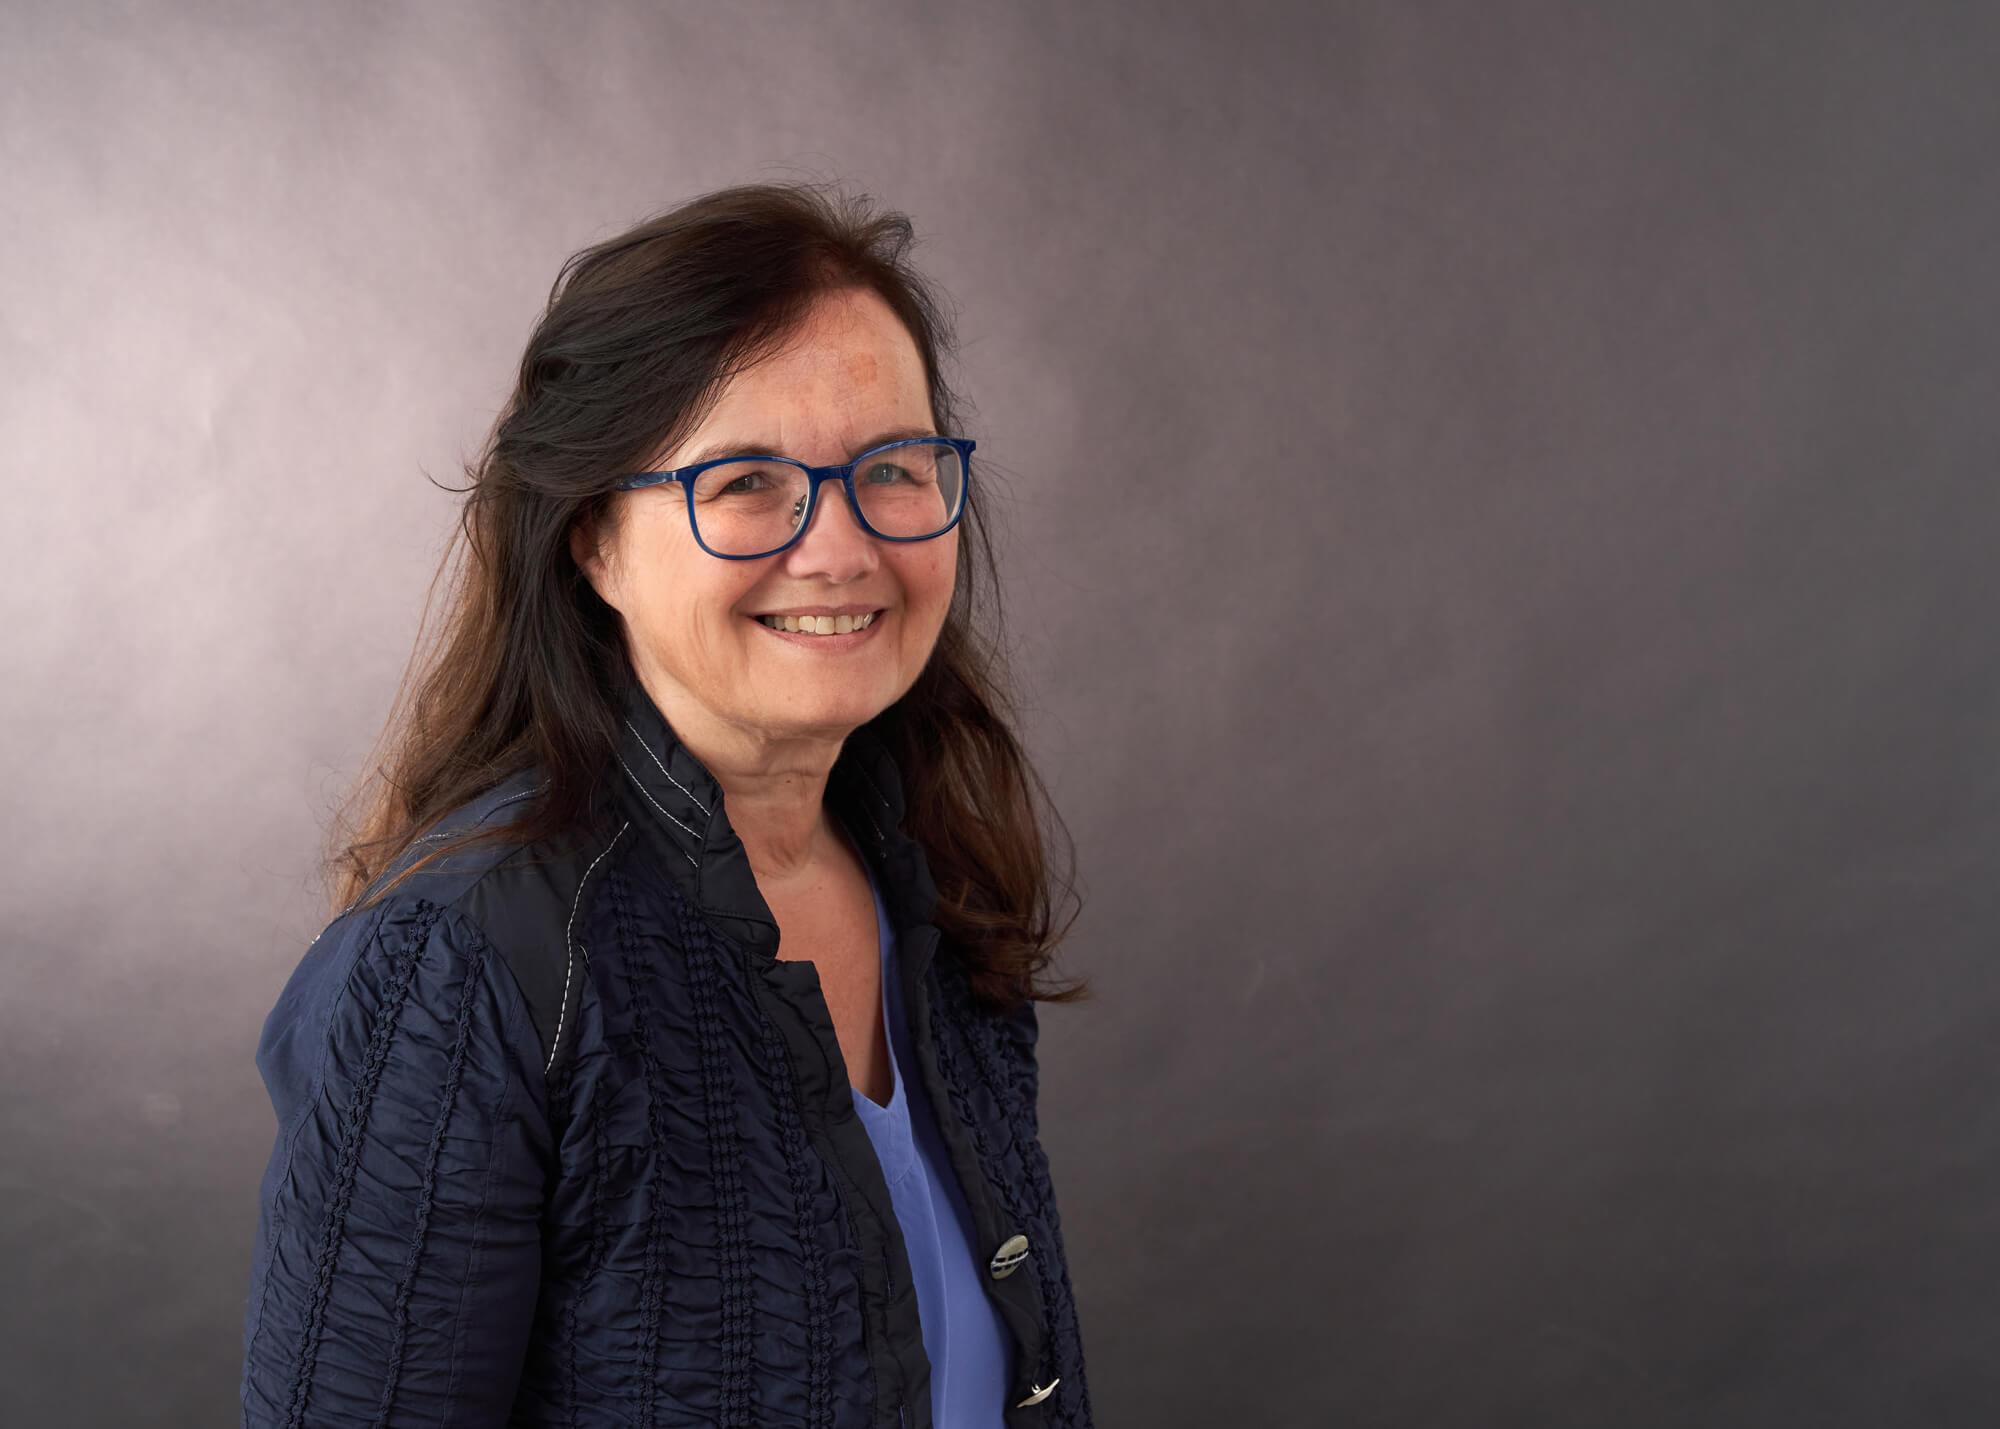 Barbara Megert